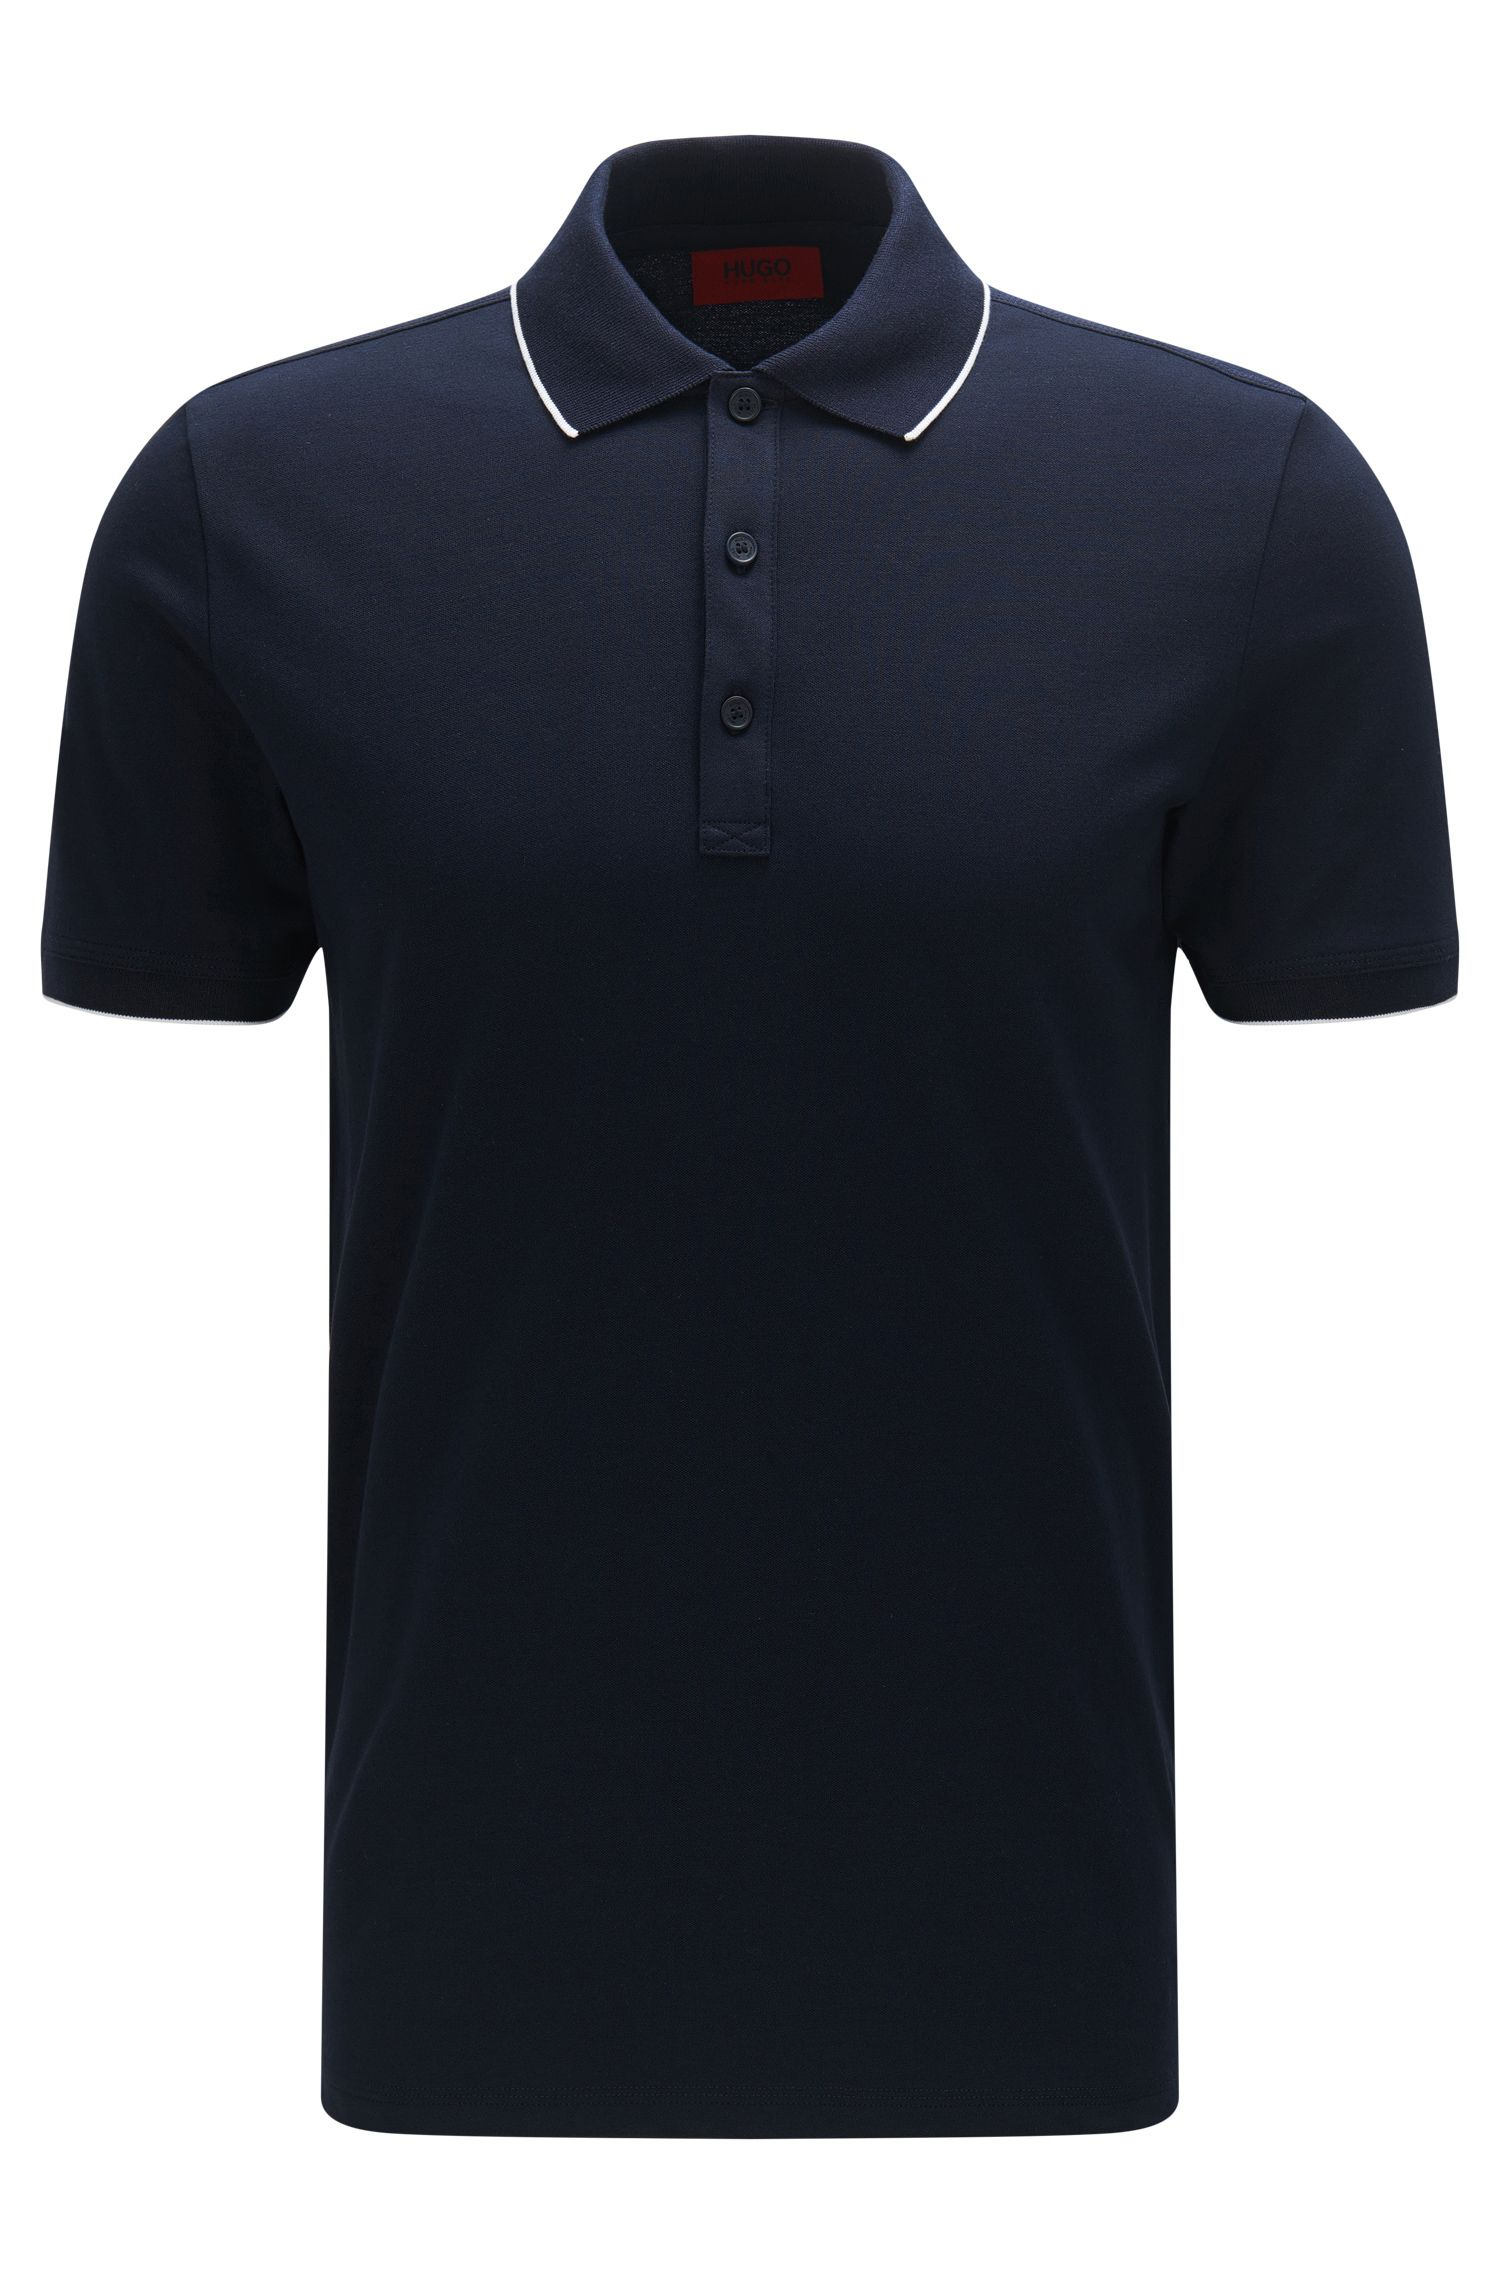 'Delorian' | Slim Fit, Stretch Cotton Polo Shirt